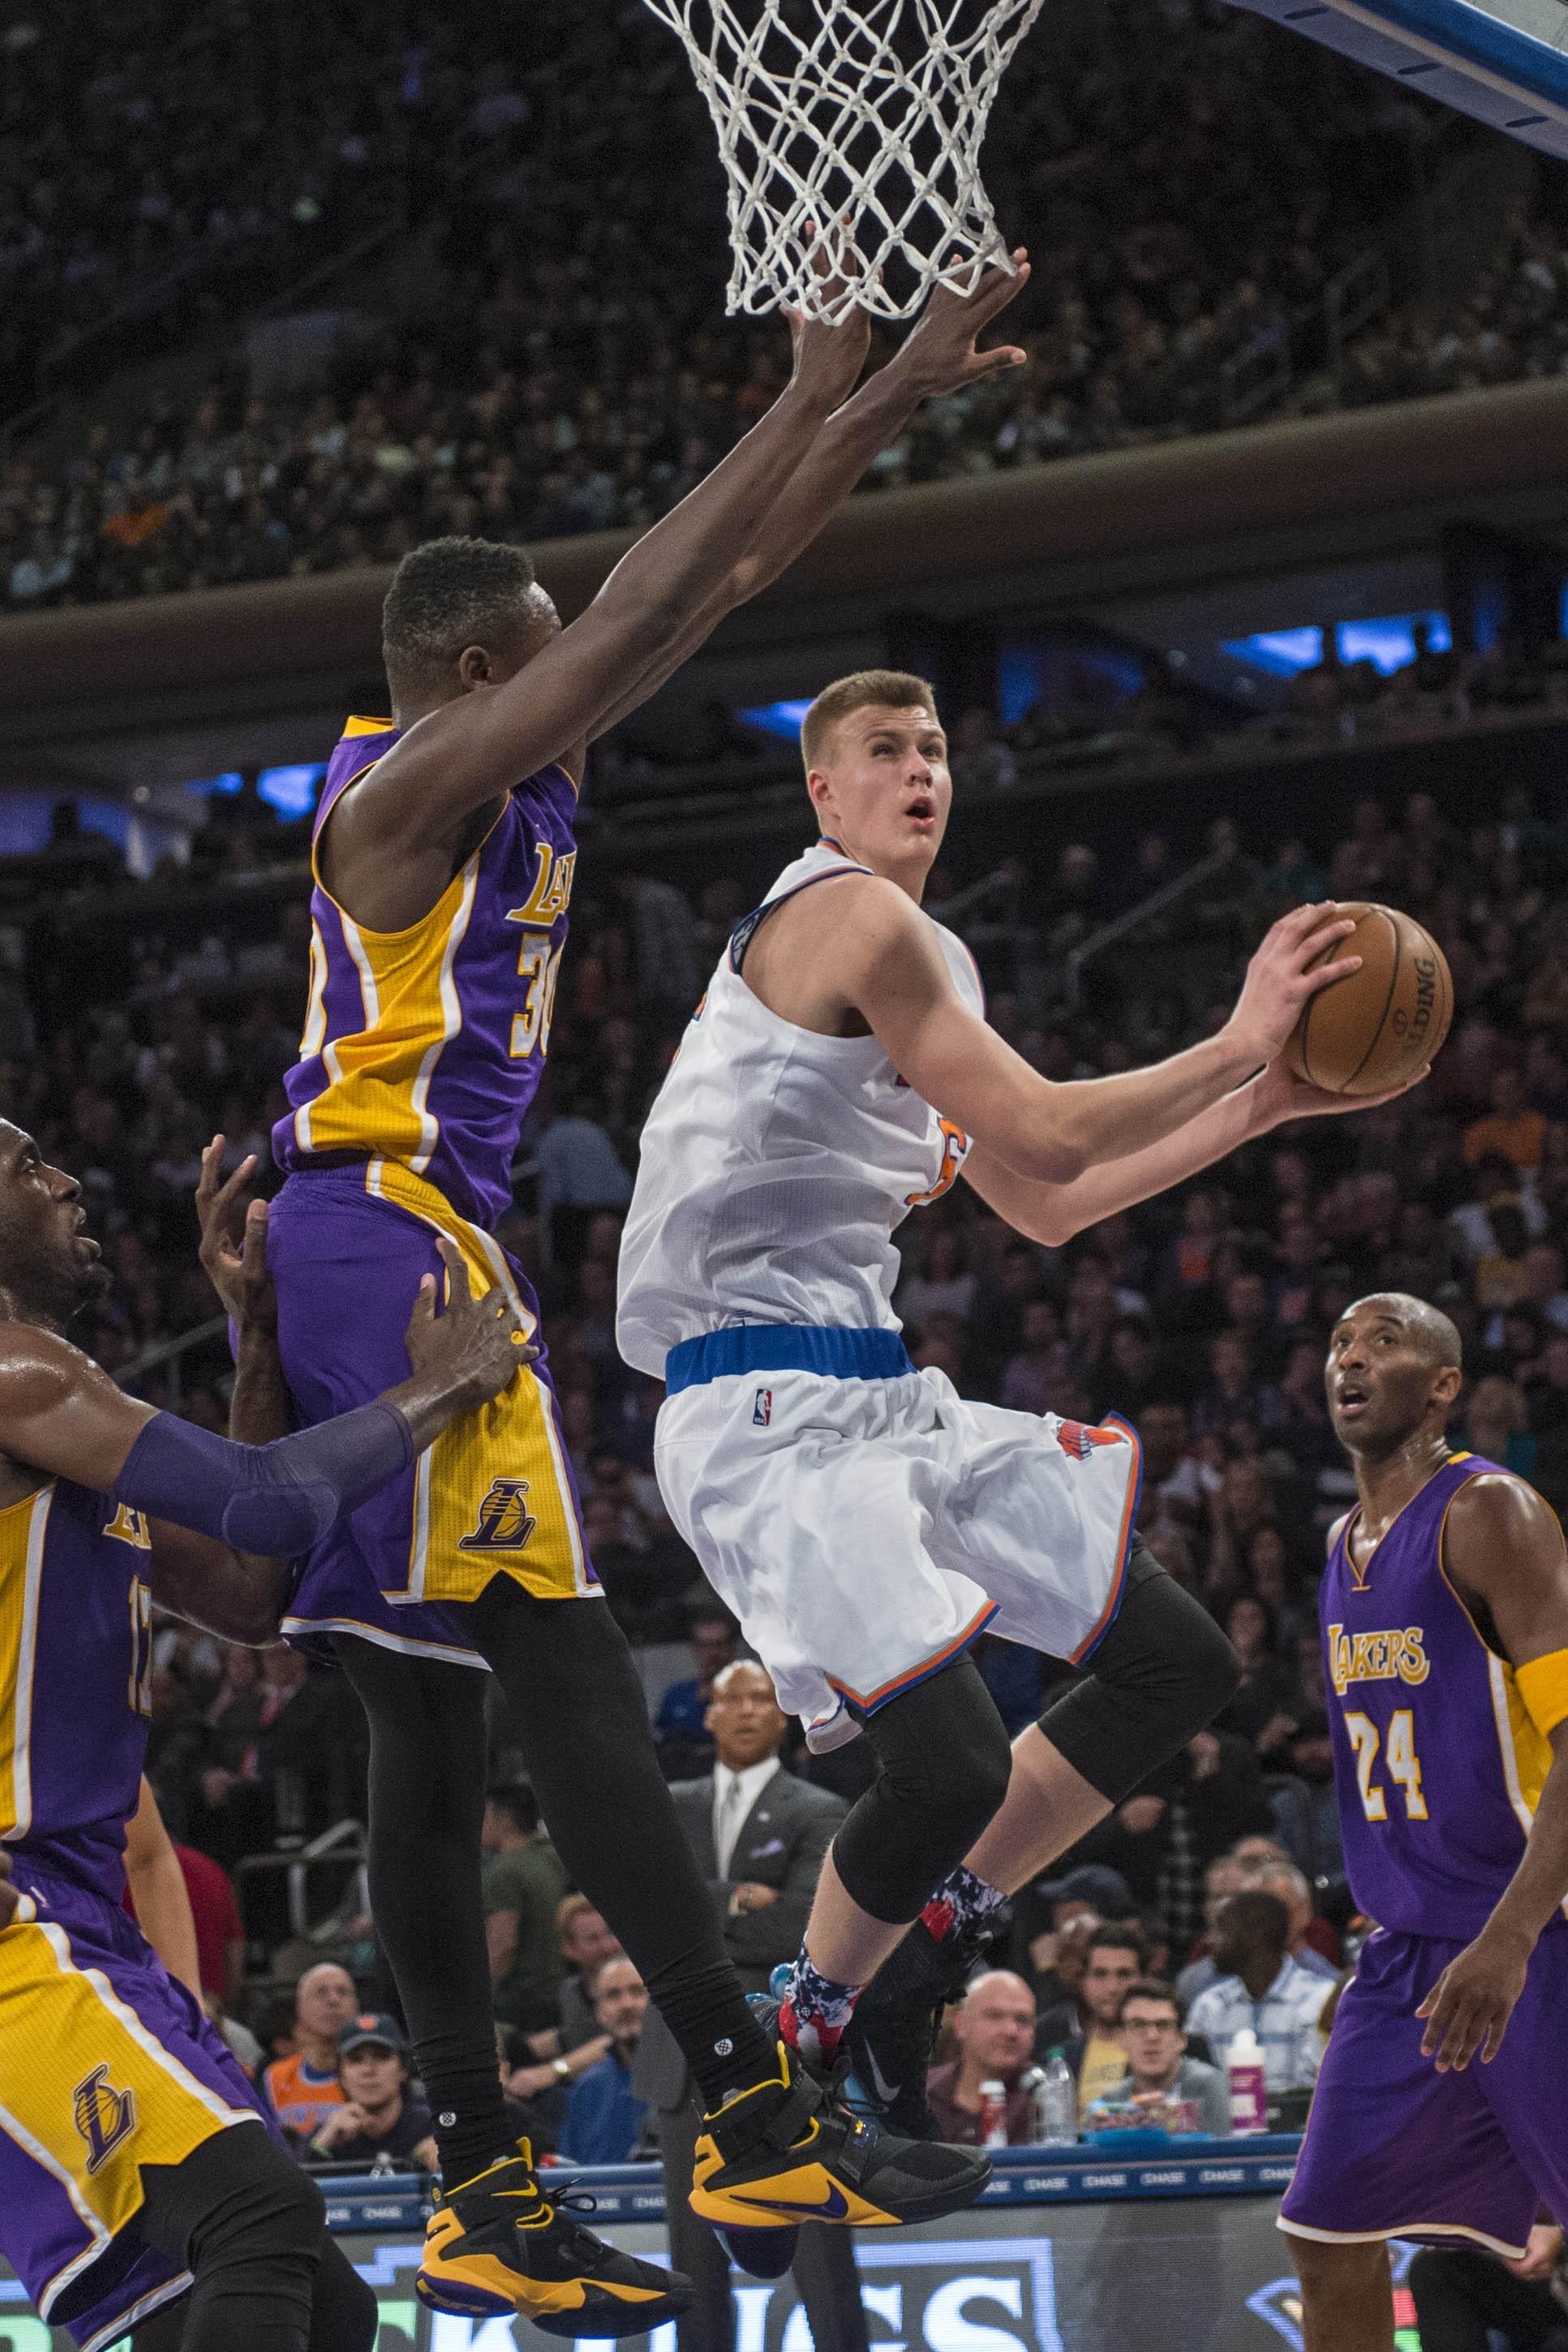 Knicks' Porzingis earns praise from Magic and Kobe ...